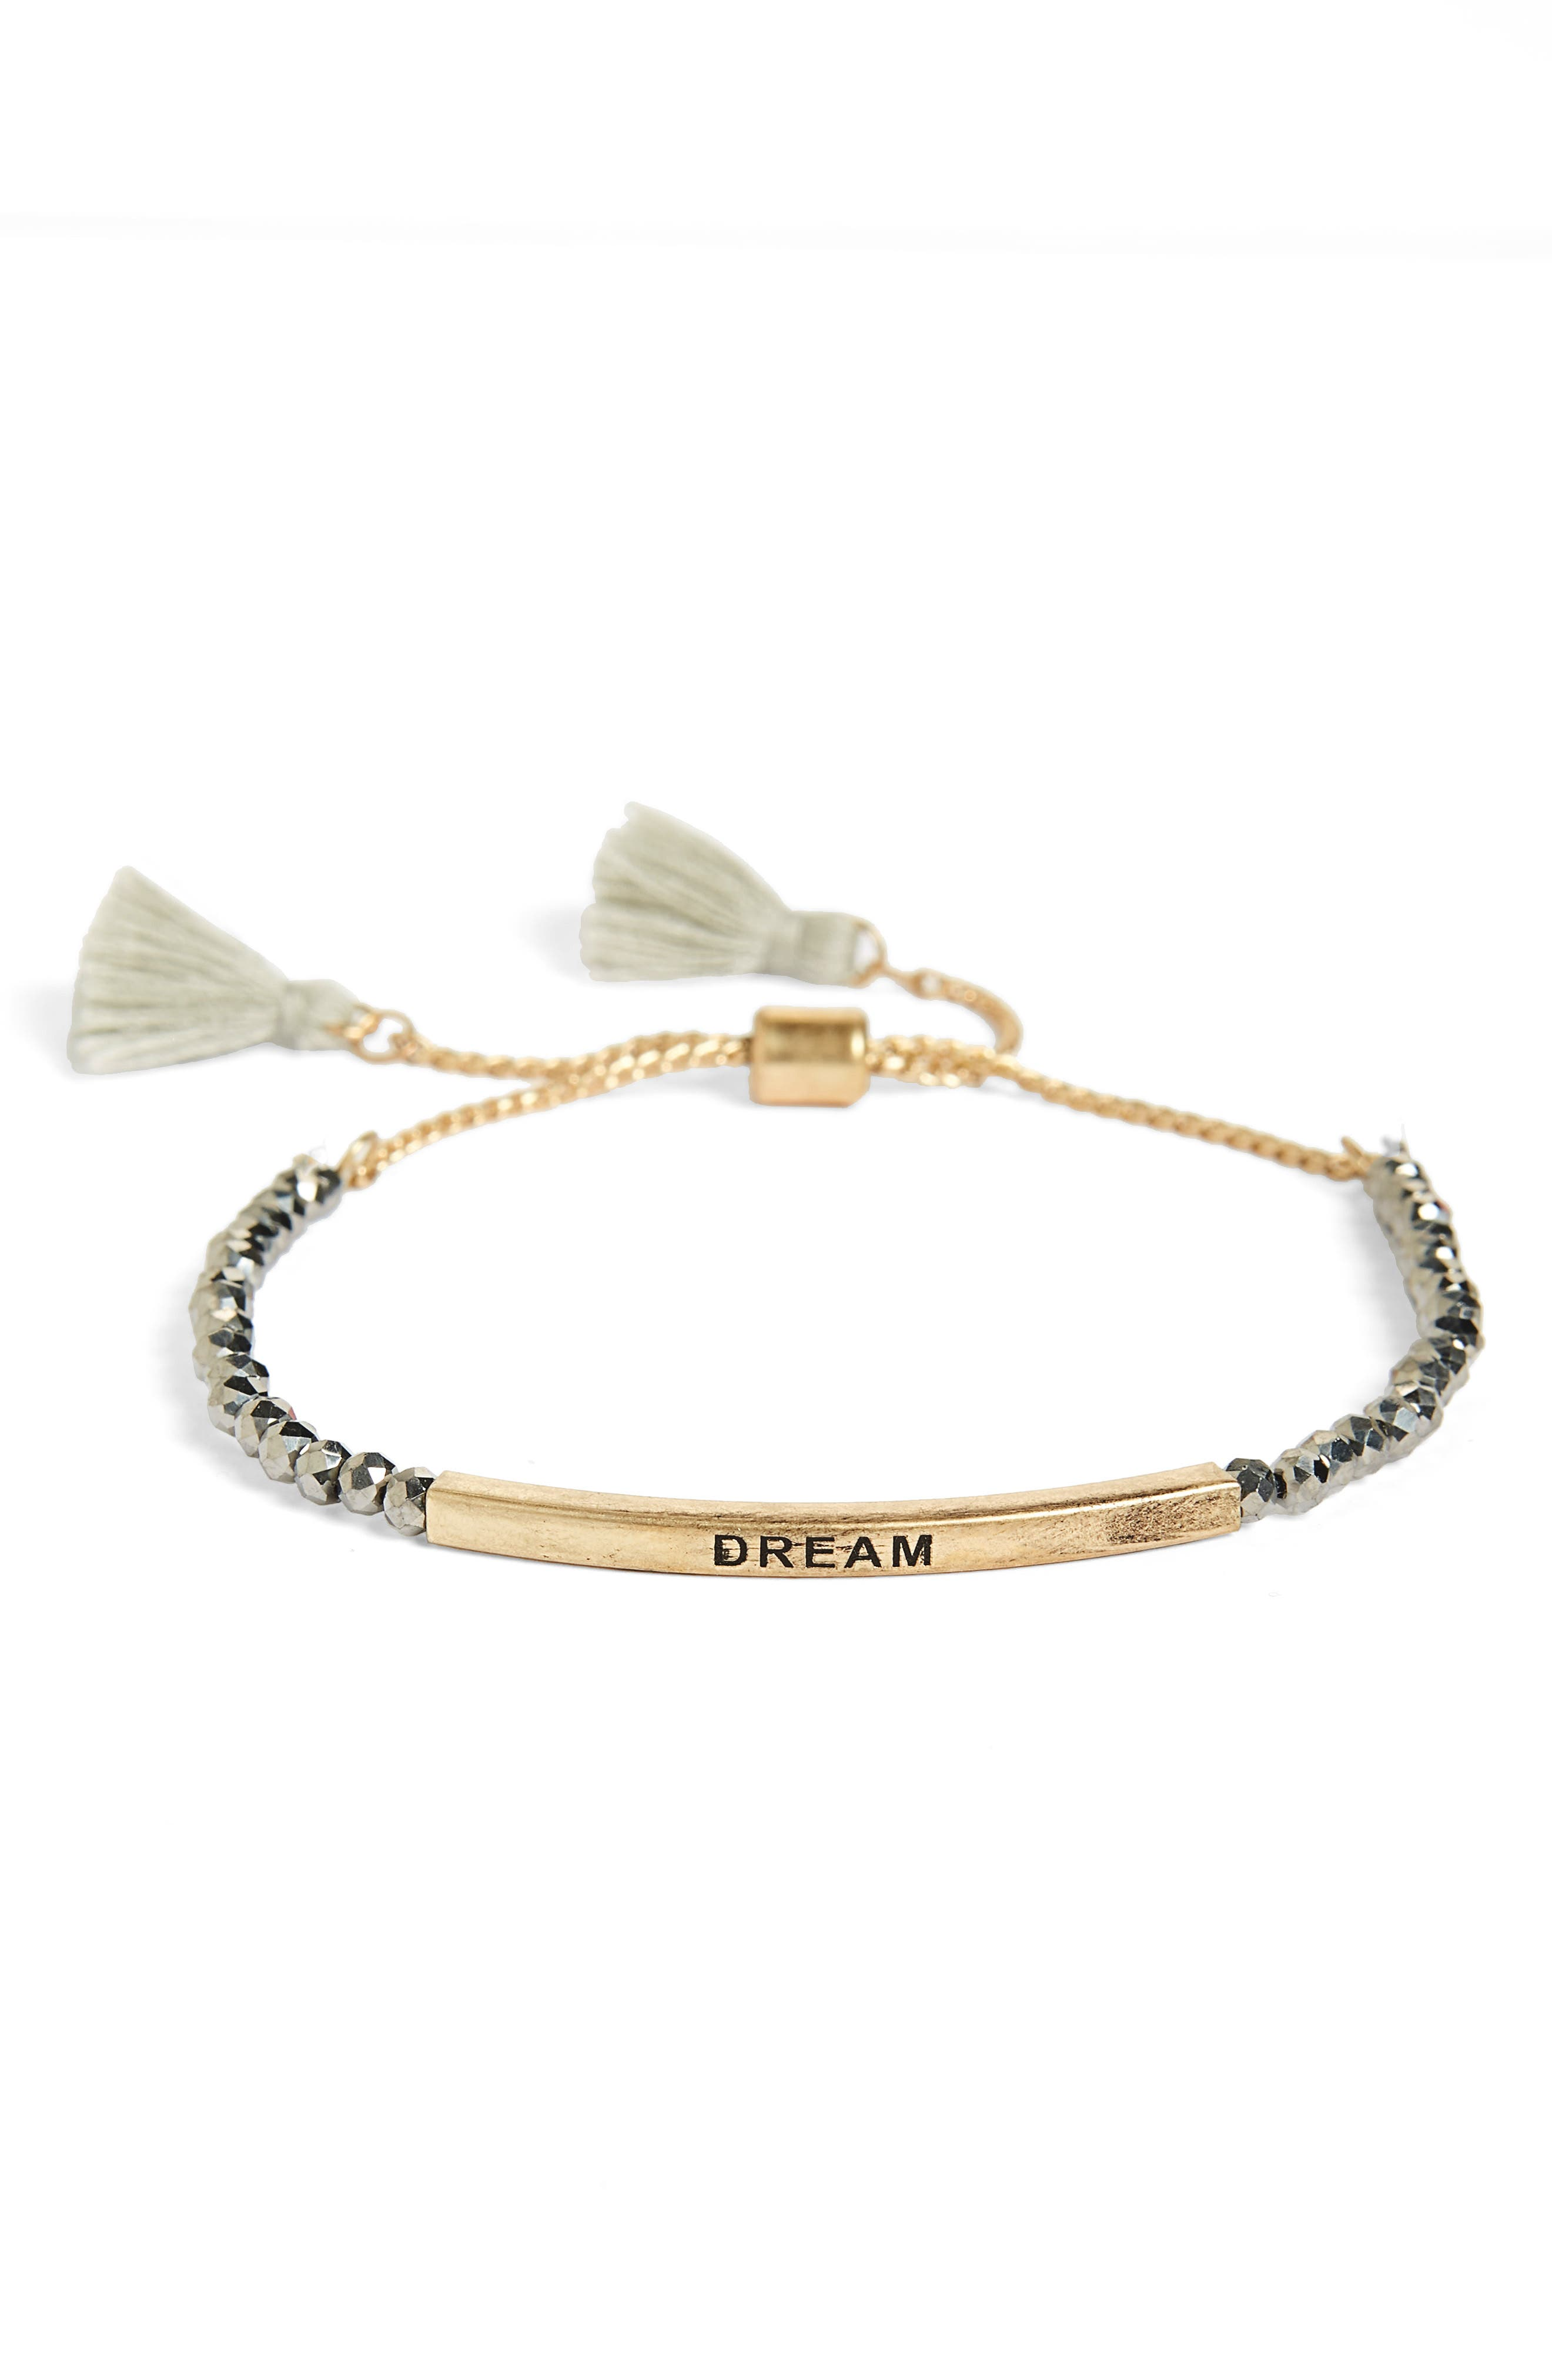 Dream Beaded Bolo Bracelet,                             Main thumbnail 1, color,                             710